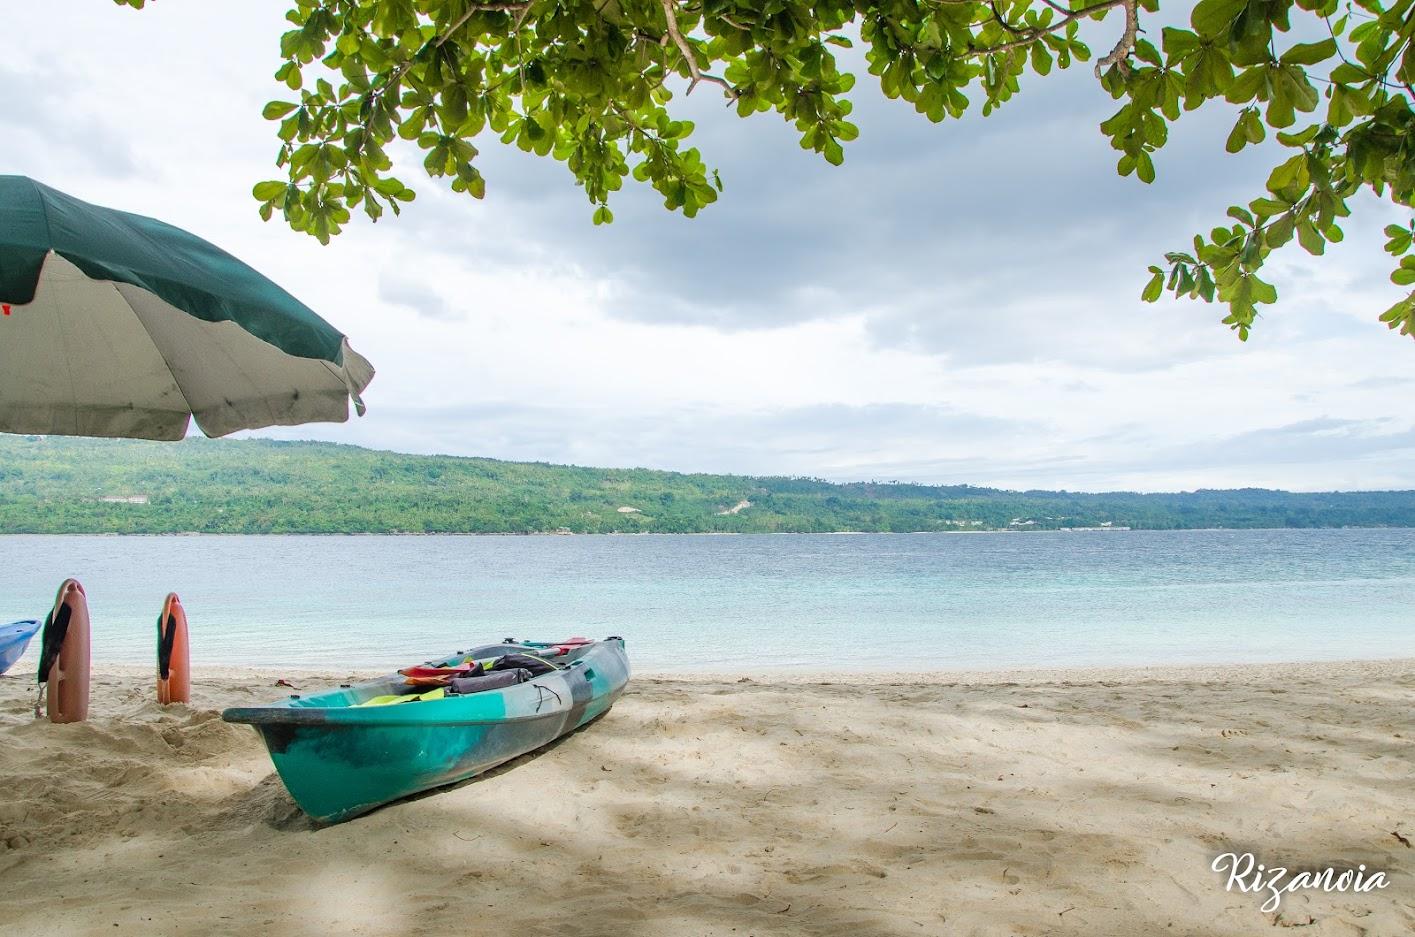 Talikud Island Travel Guide